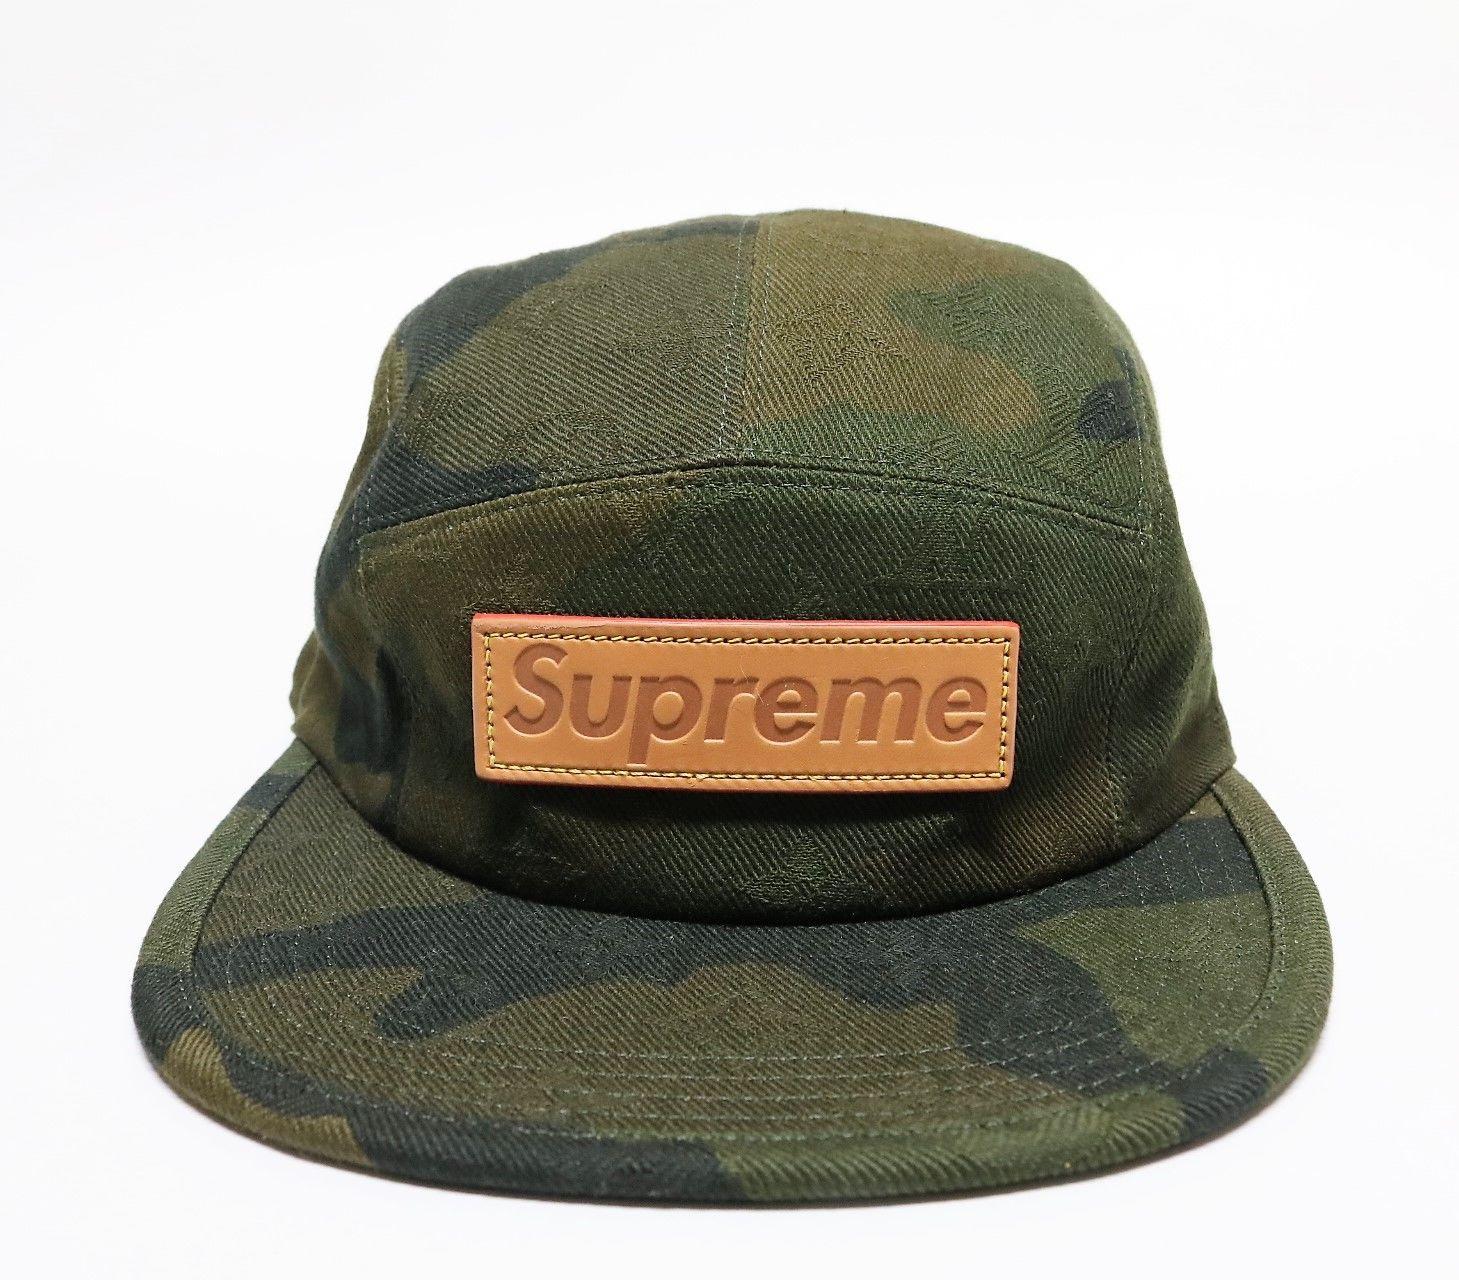 Louis Vuitton/Supreme Camp Cap